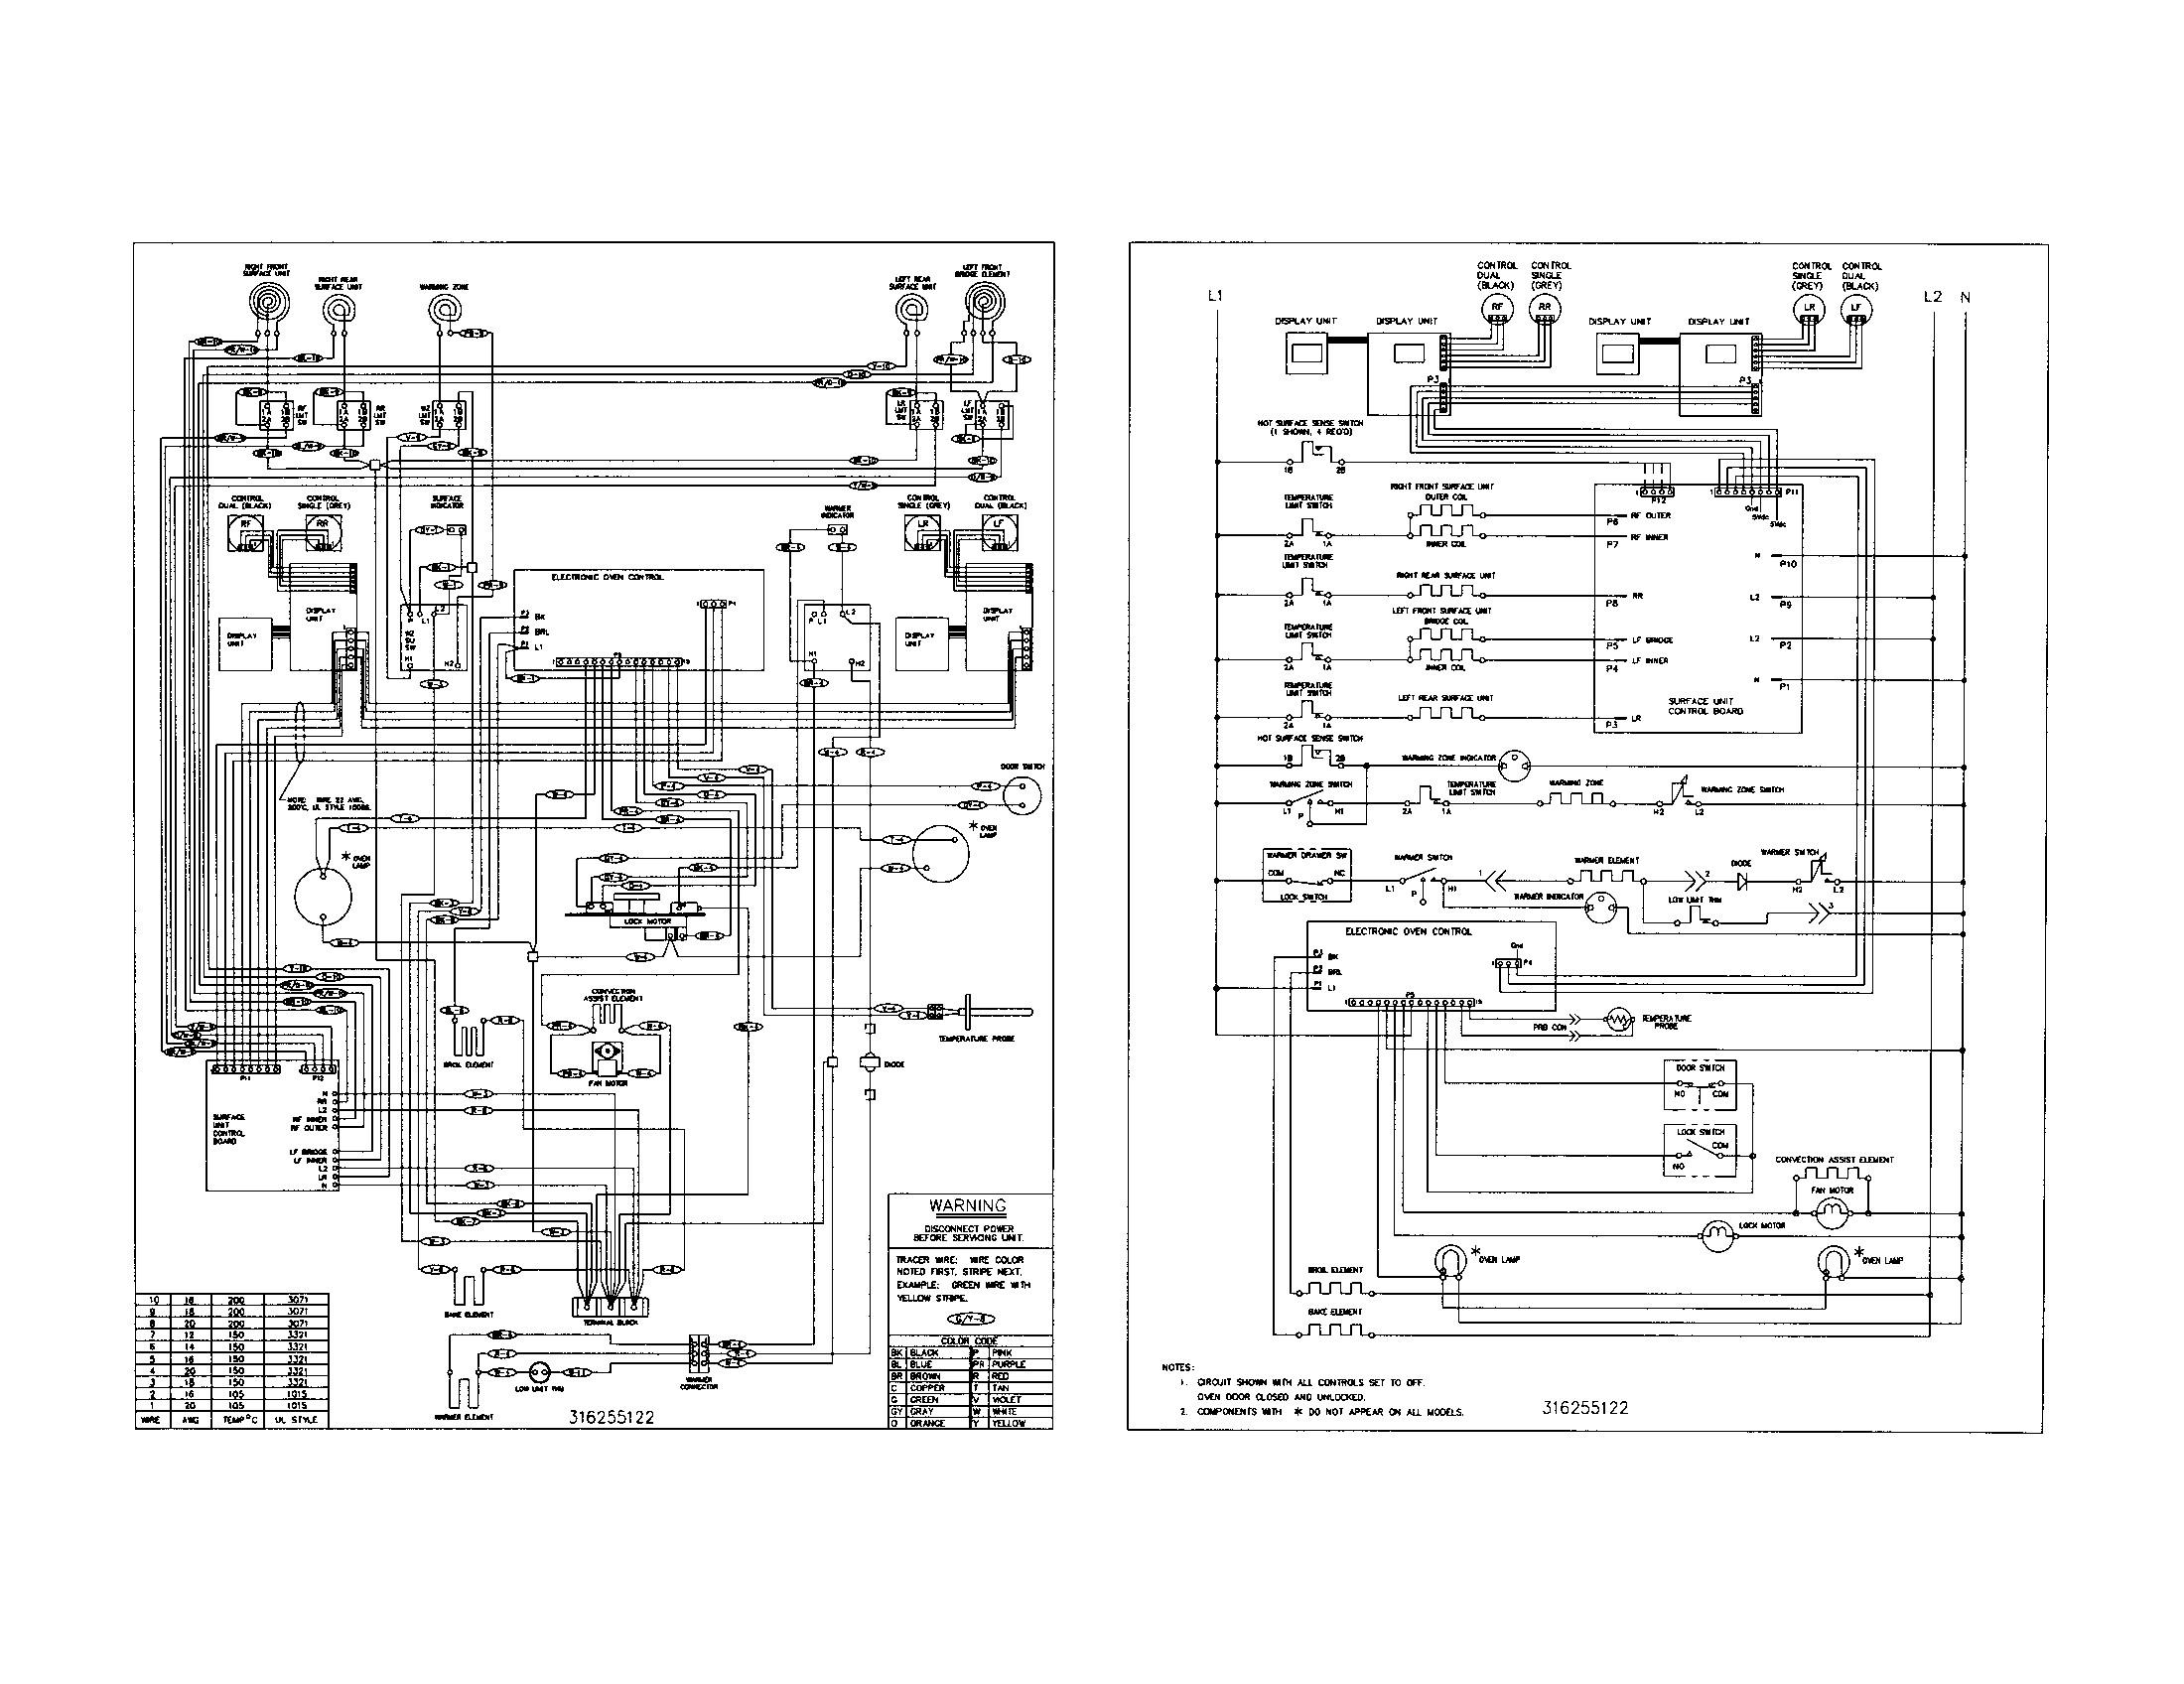 kenmore oven wiring diagram wiring diagram data GE Range Wiring Diagram wiring diagram for kenmore wall oven diagram data schema kenmore oven wiring diagram